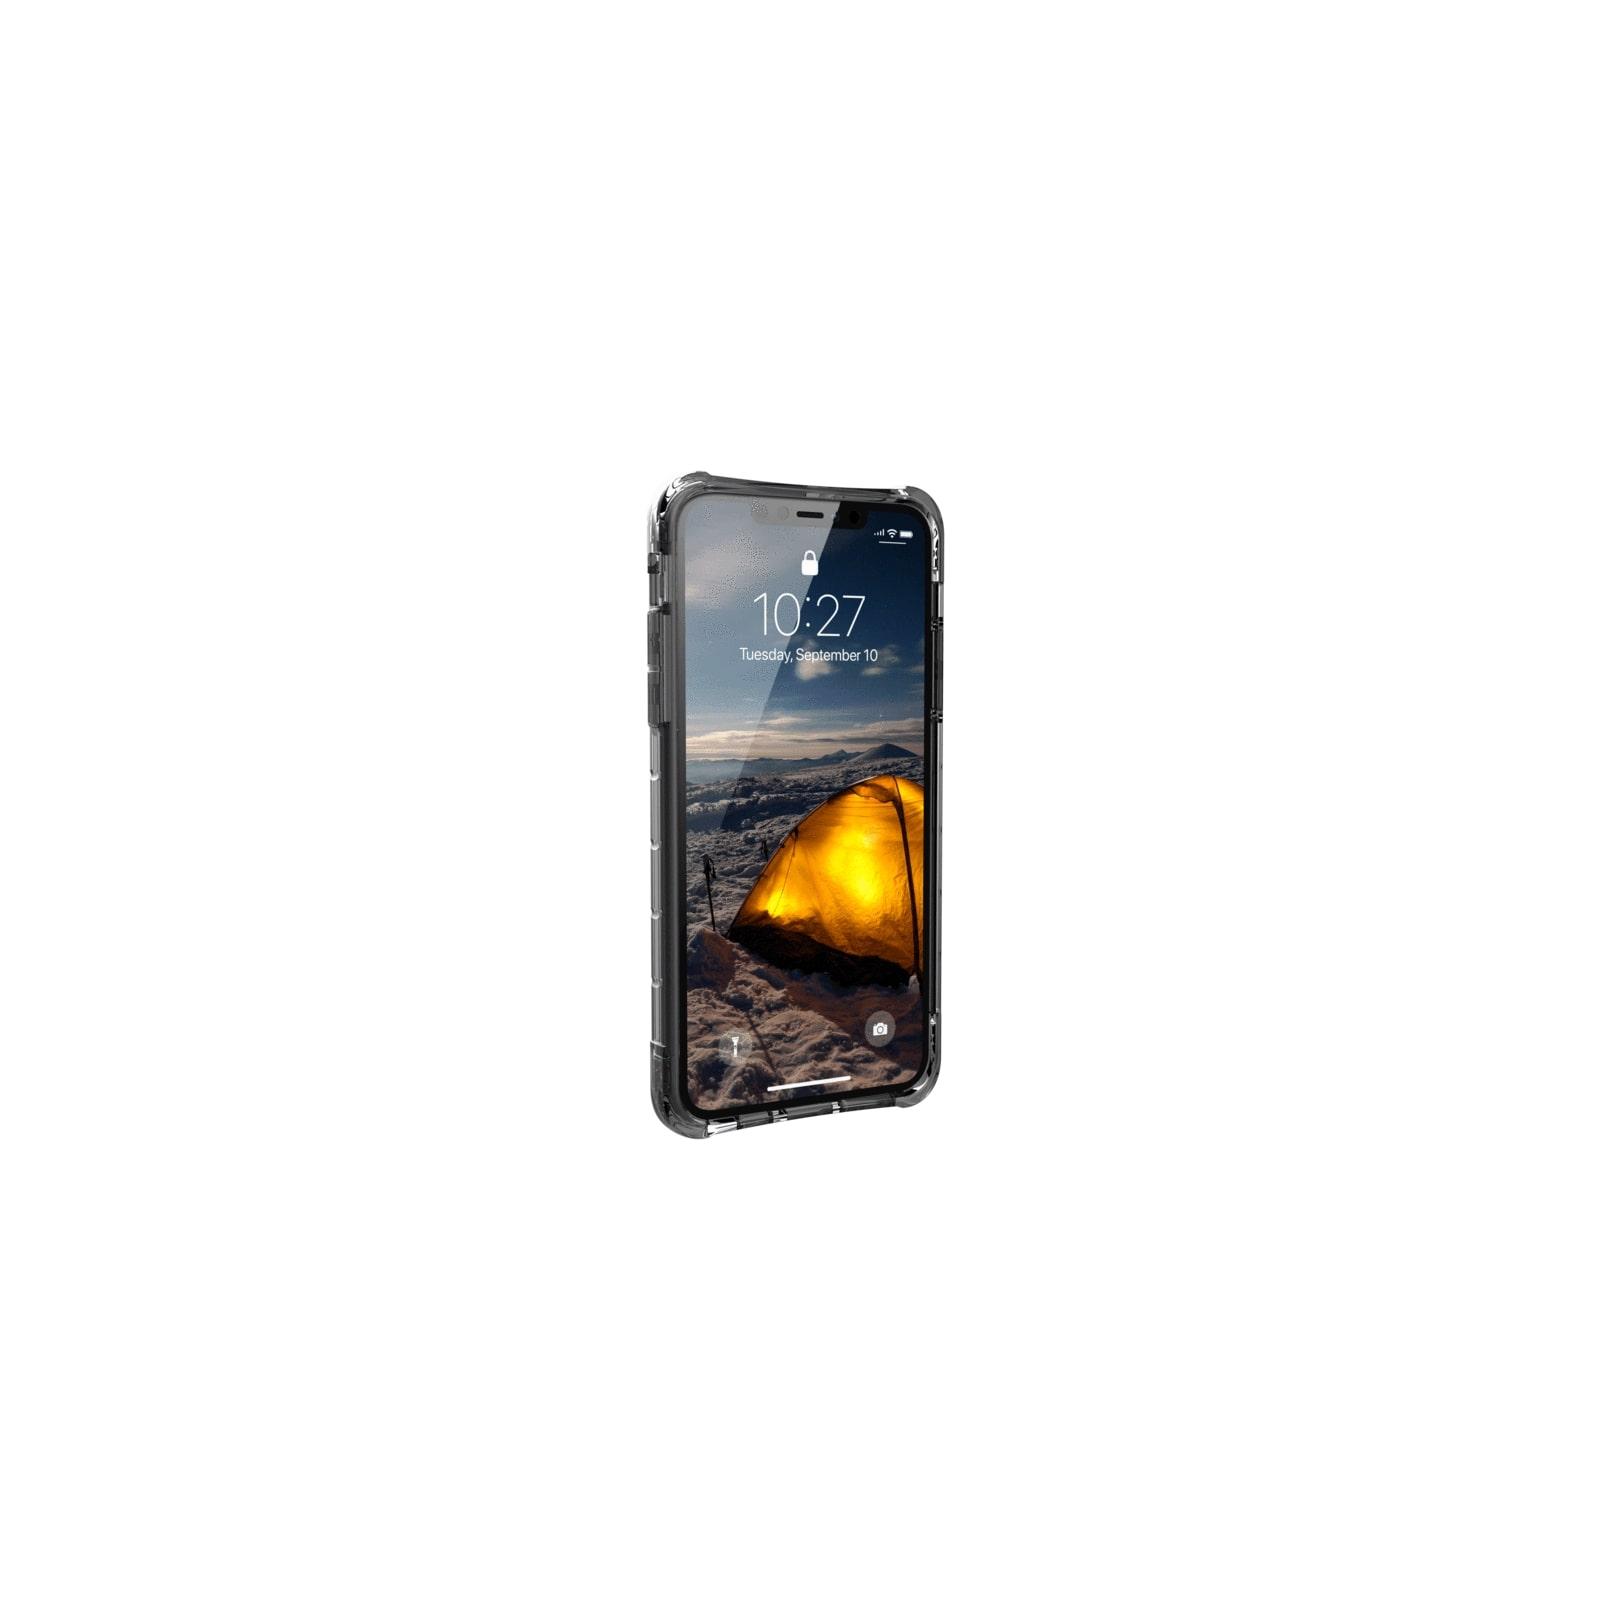 Чехол для моб. телефона Uag iPhone 11 Pro Max Plyo, Ice (111722114343) изображение 5